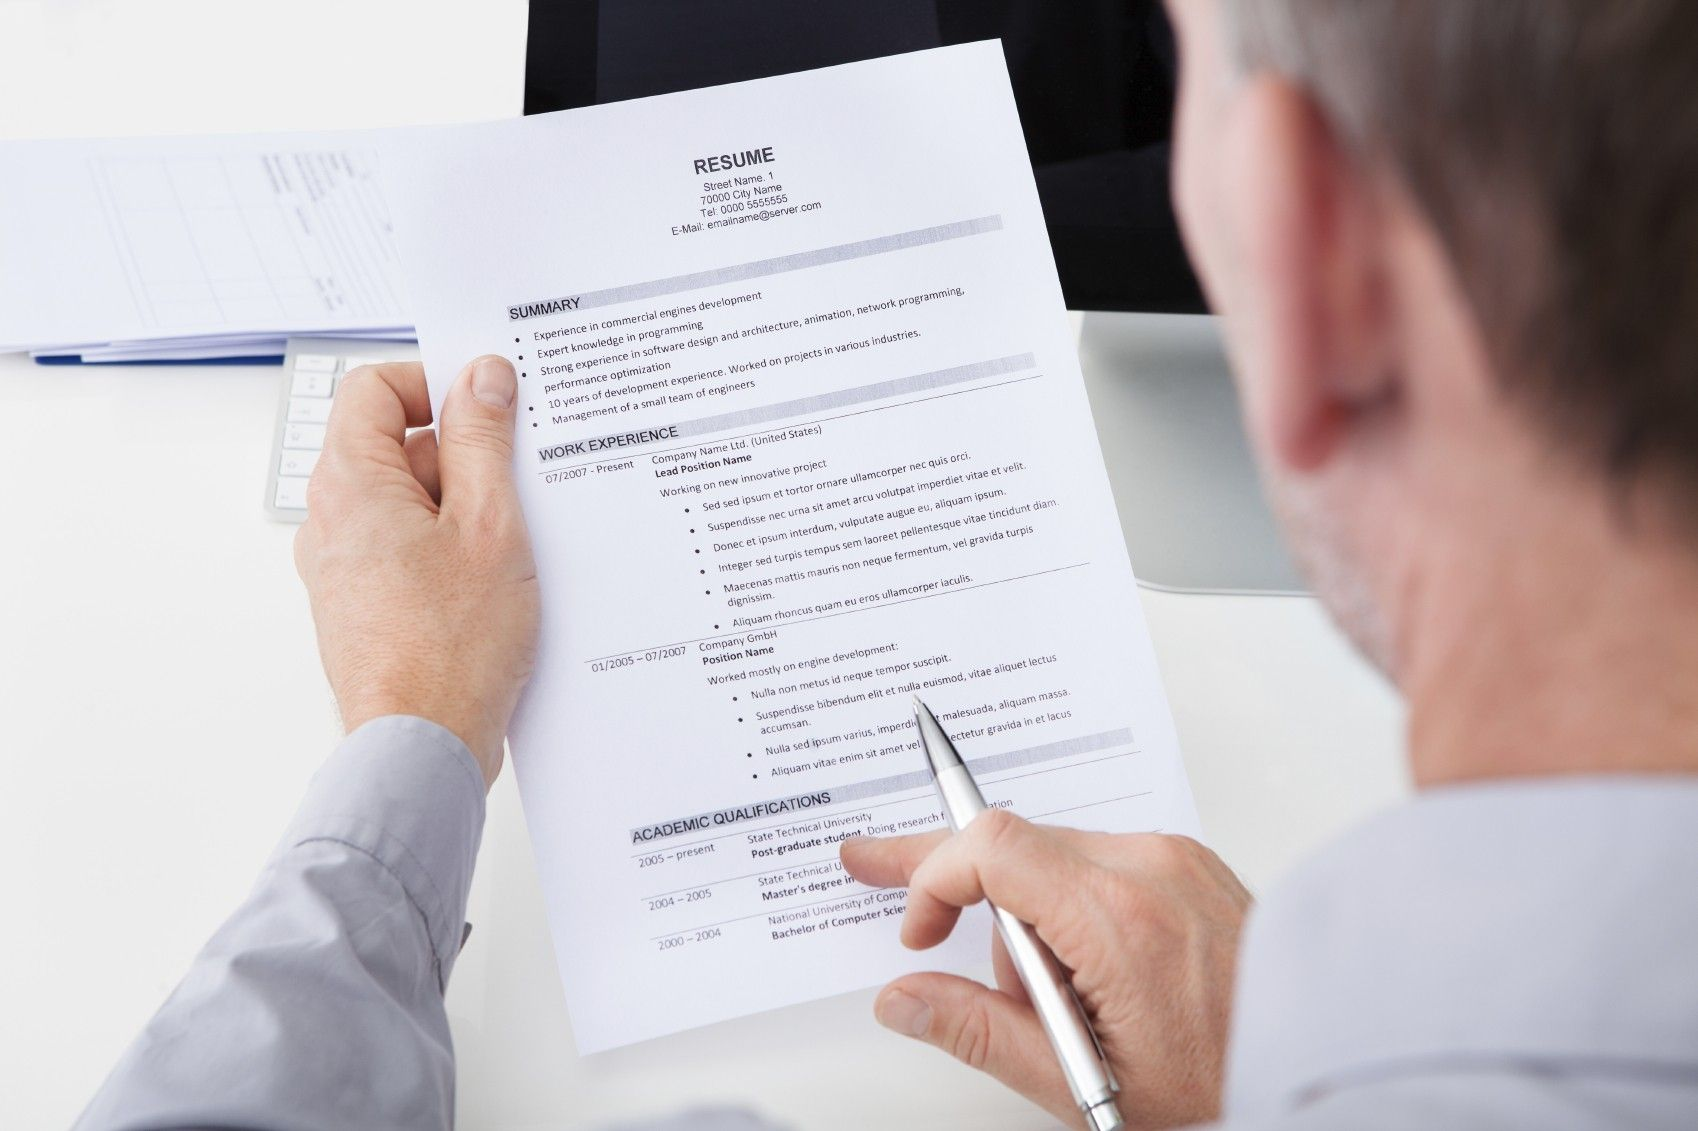 6signsofagreatresume Resume writing tips, Effective